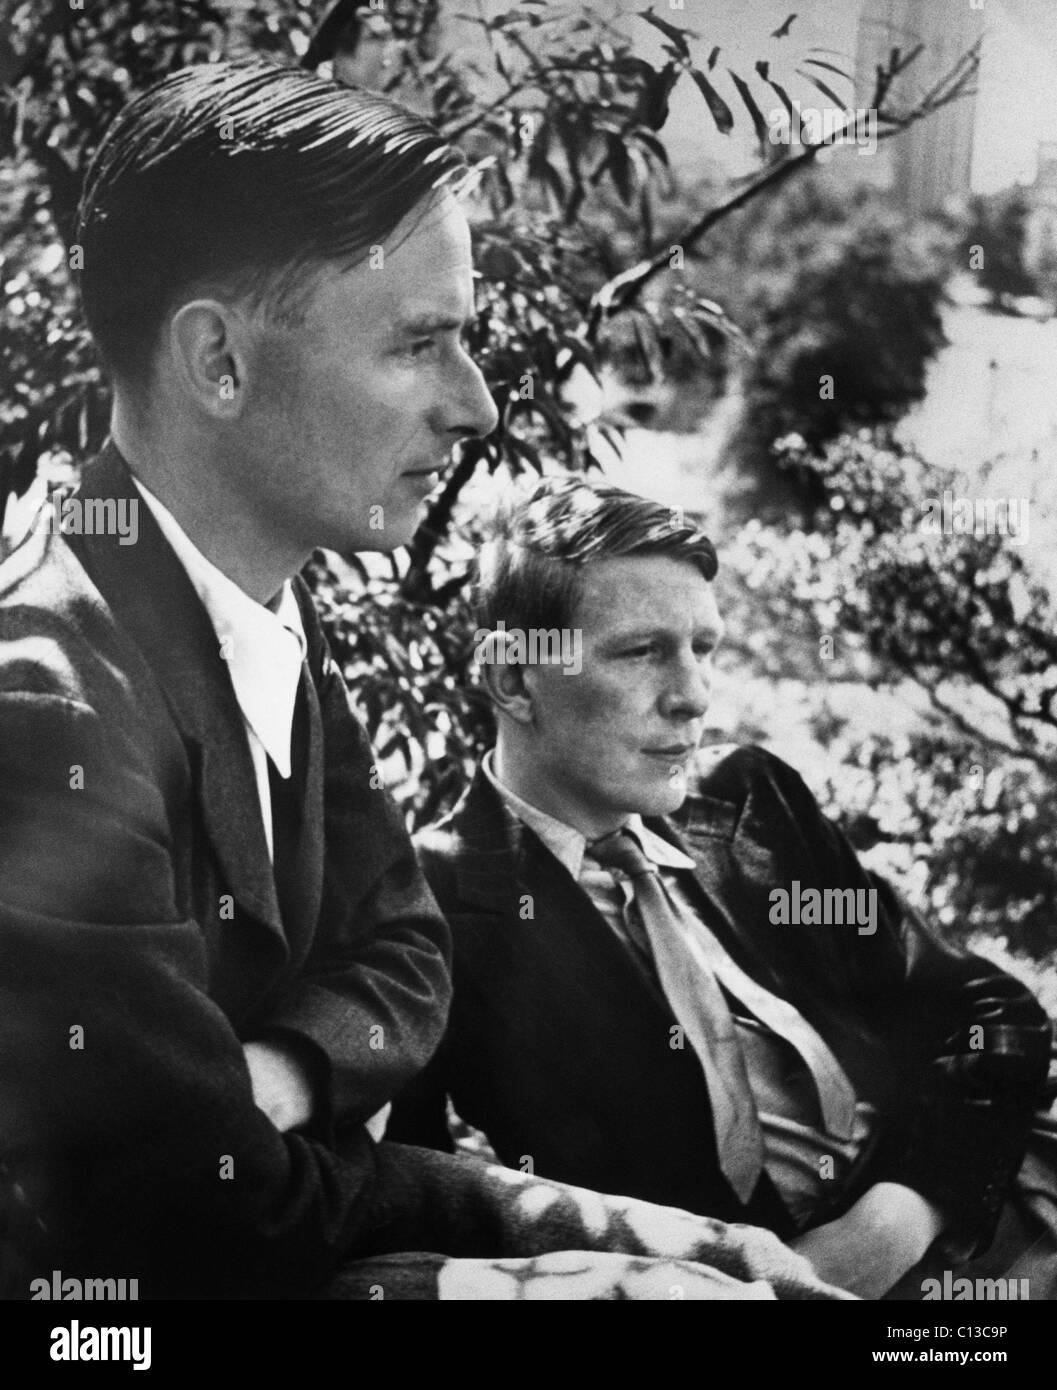 Christopher Isherwood, novelist, and W.H. Auden, poet, circa 1930s. - Stock Image